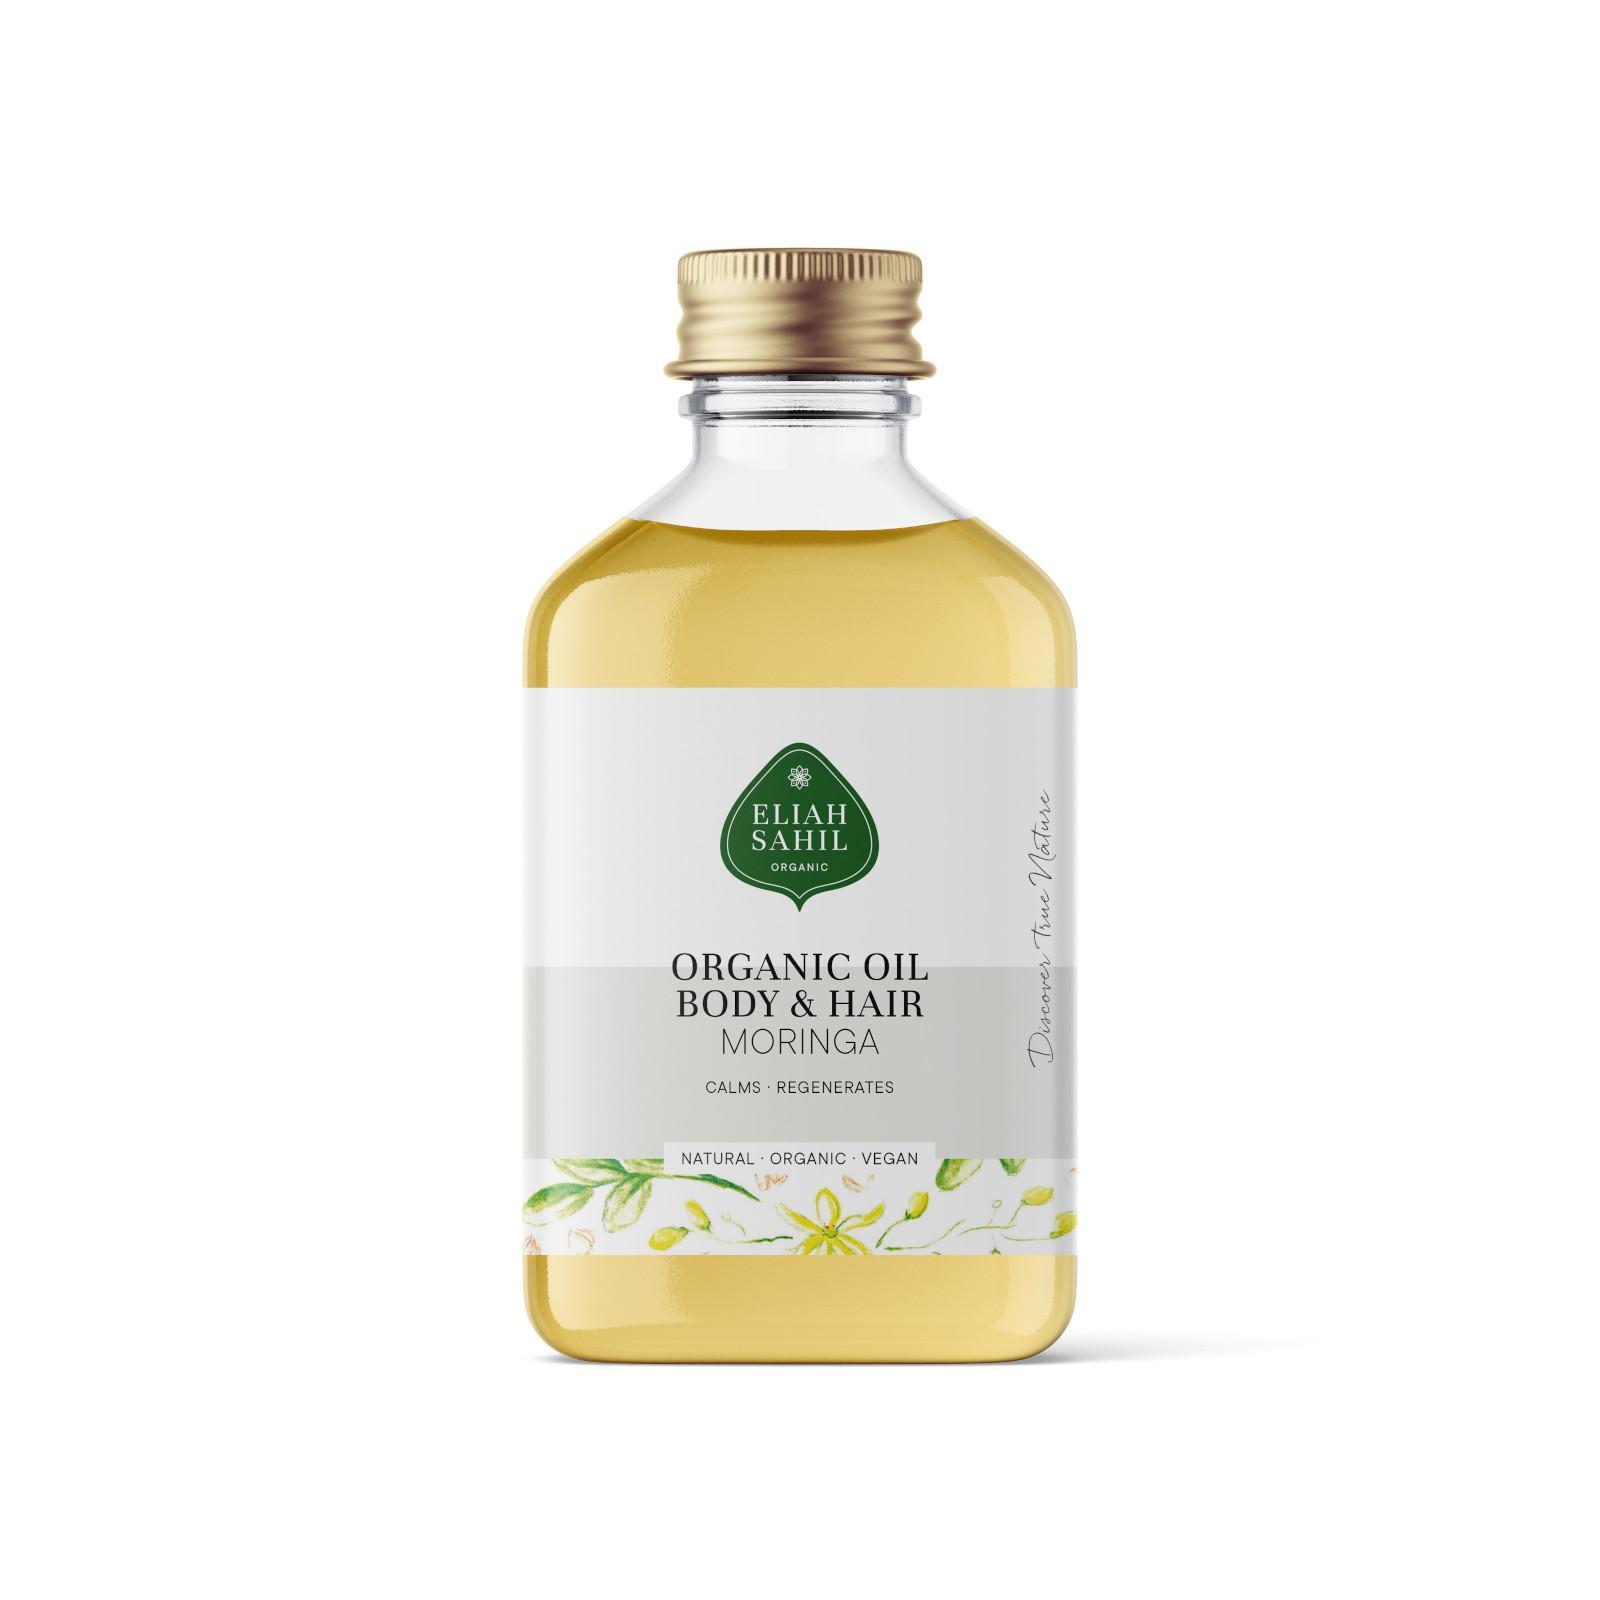 Eliah Sahil Ájurvédský tělový a vlasový olej Moringa, Bio 100 ml